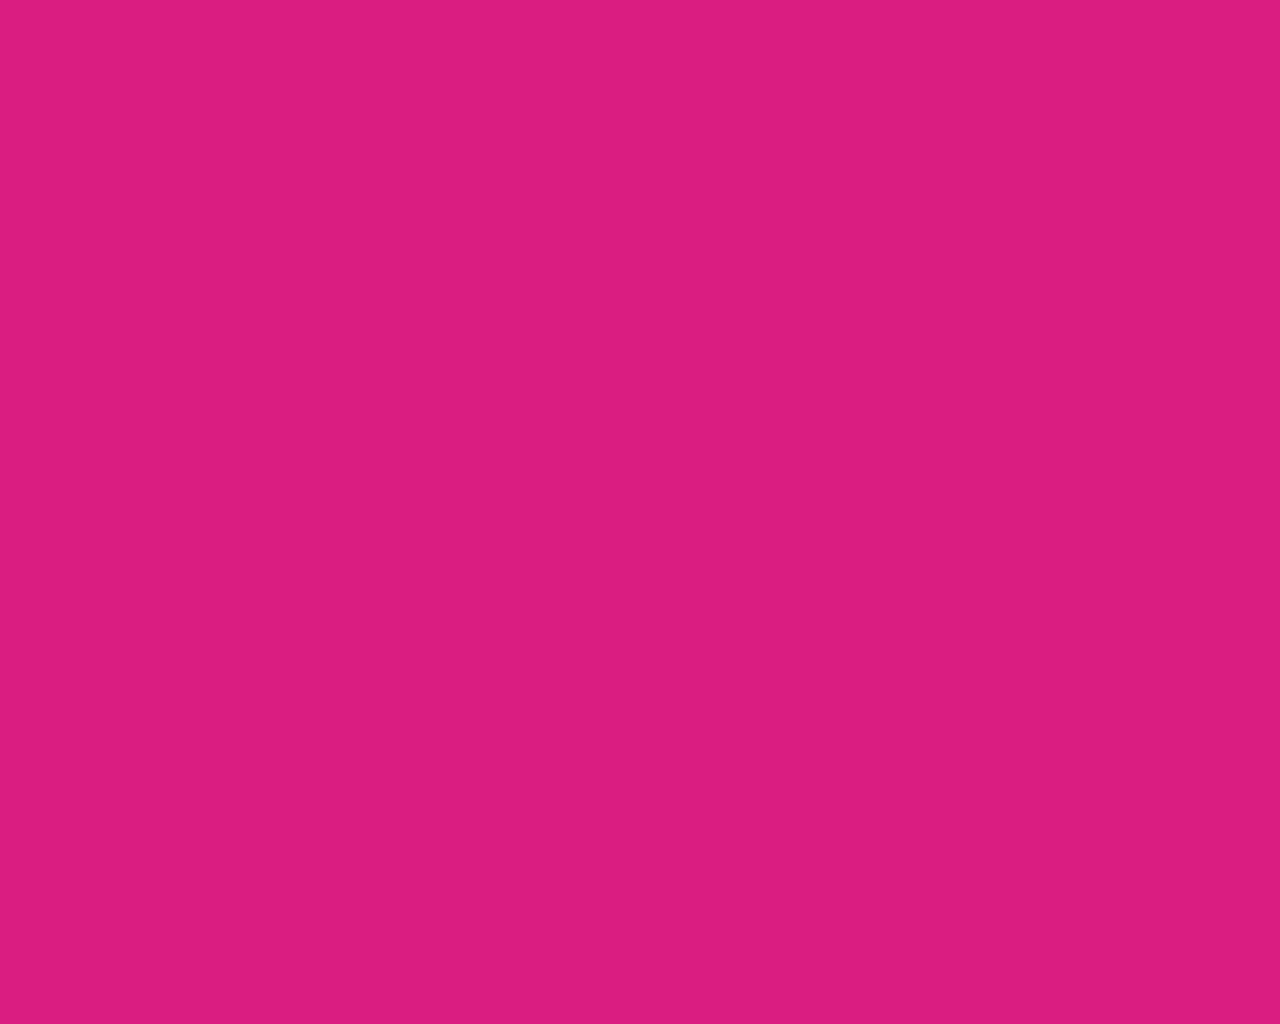 1280x1024 Vivid Cerise Solid Color Background